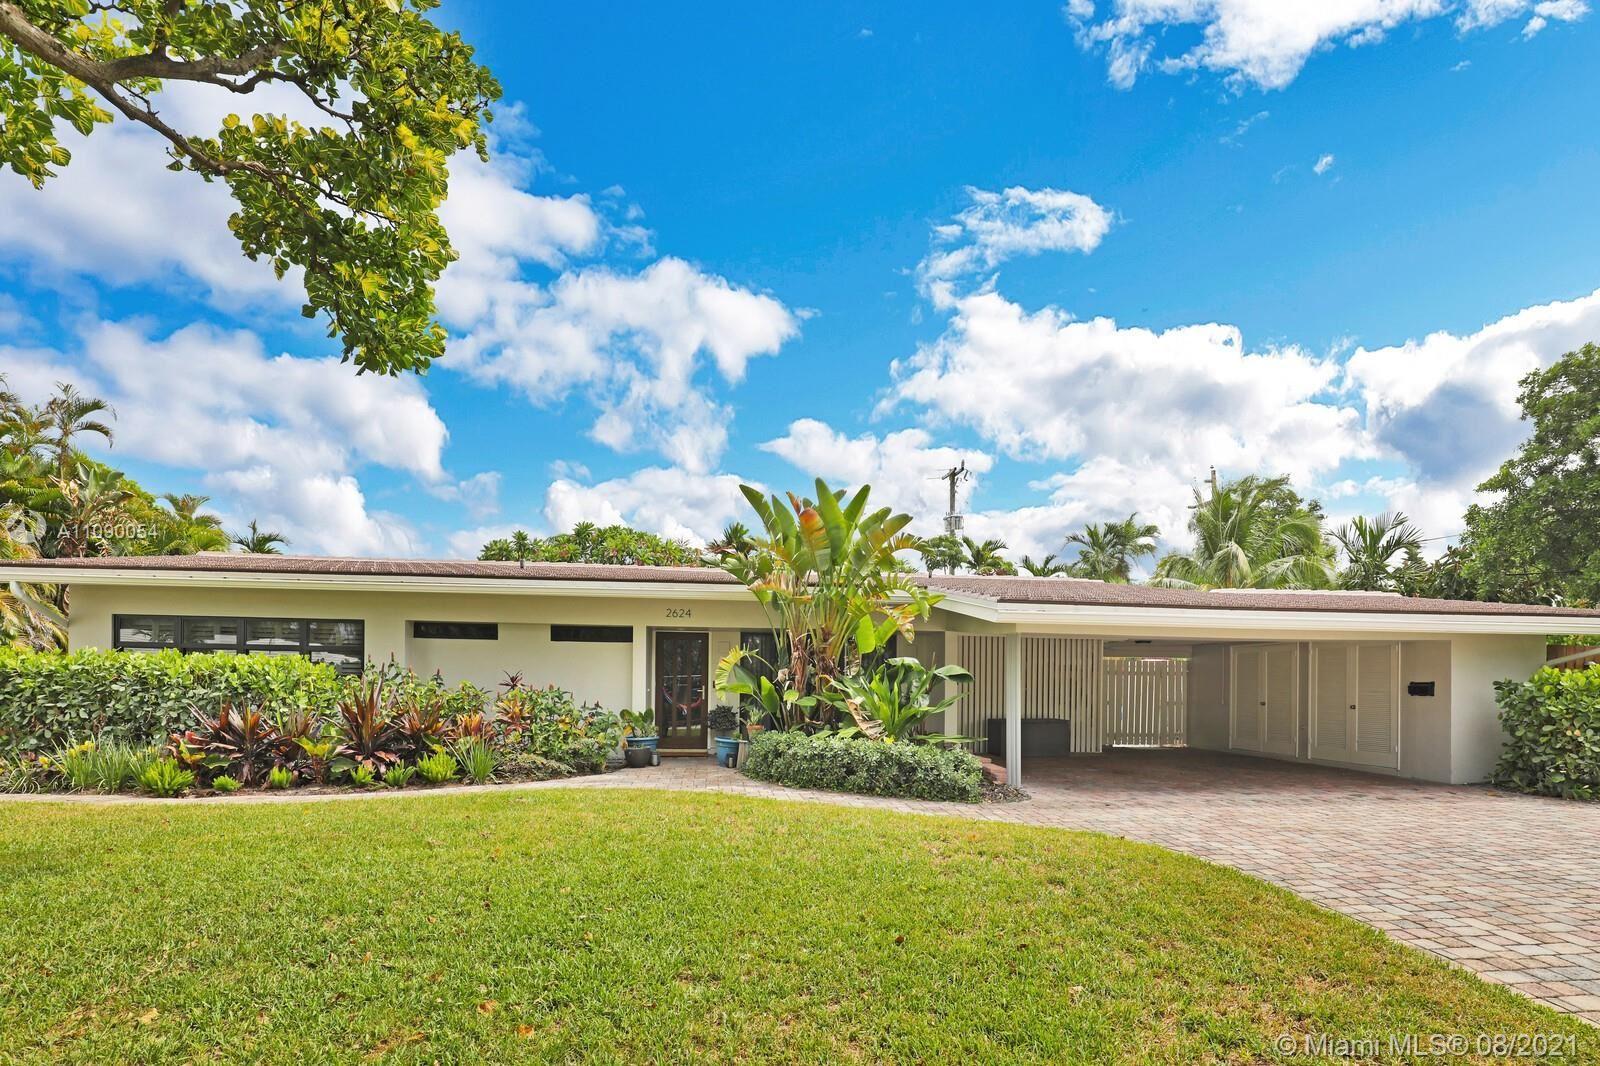 2624 NE 29th St, Fort Lauderdale, FL 33306 - #: A11090054